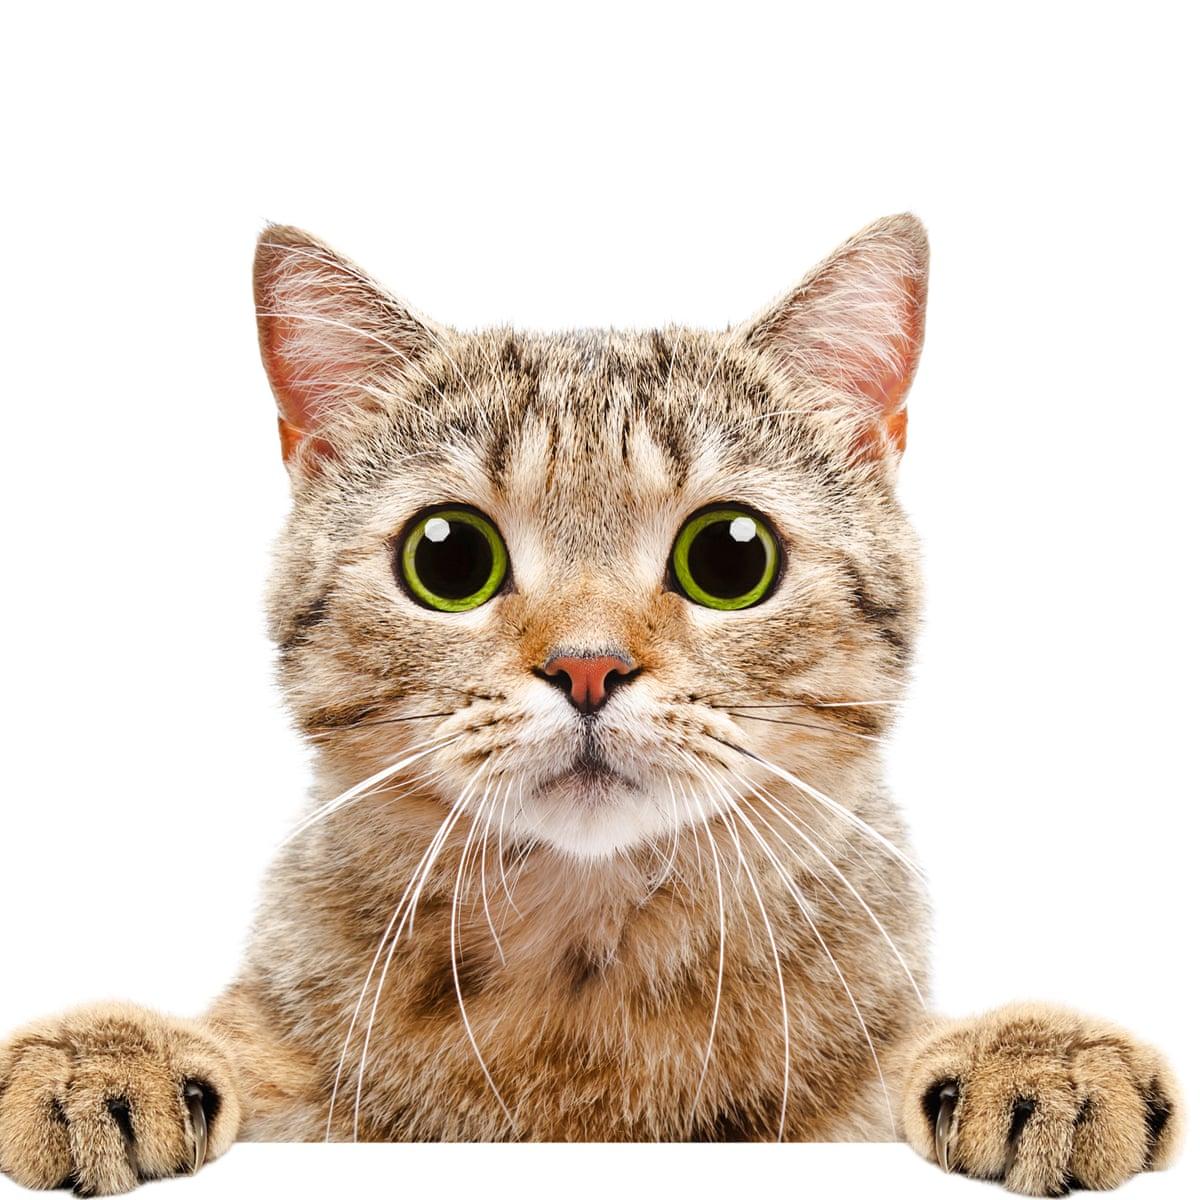 Download Adorable Cat Pictures Photos Images JBJjSAIhk